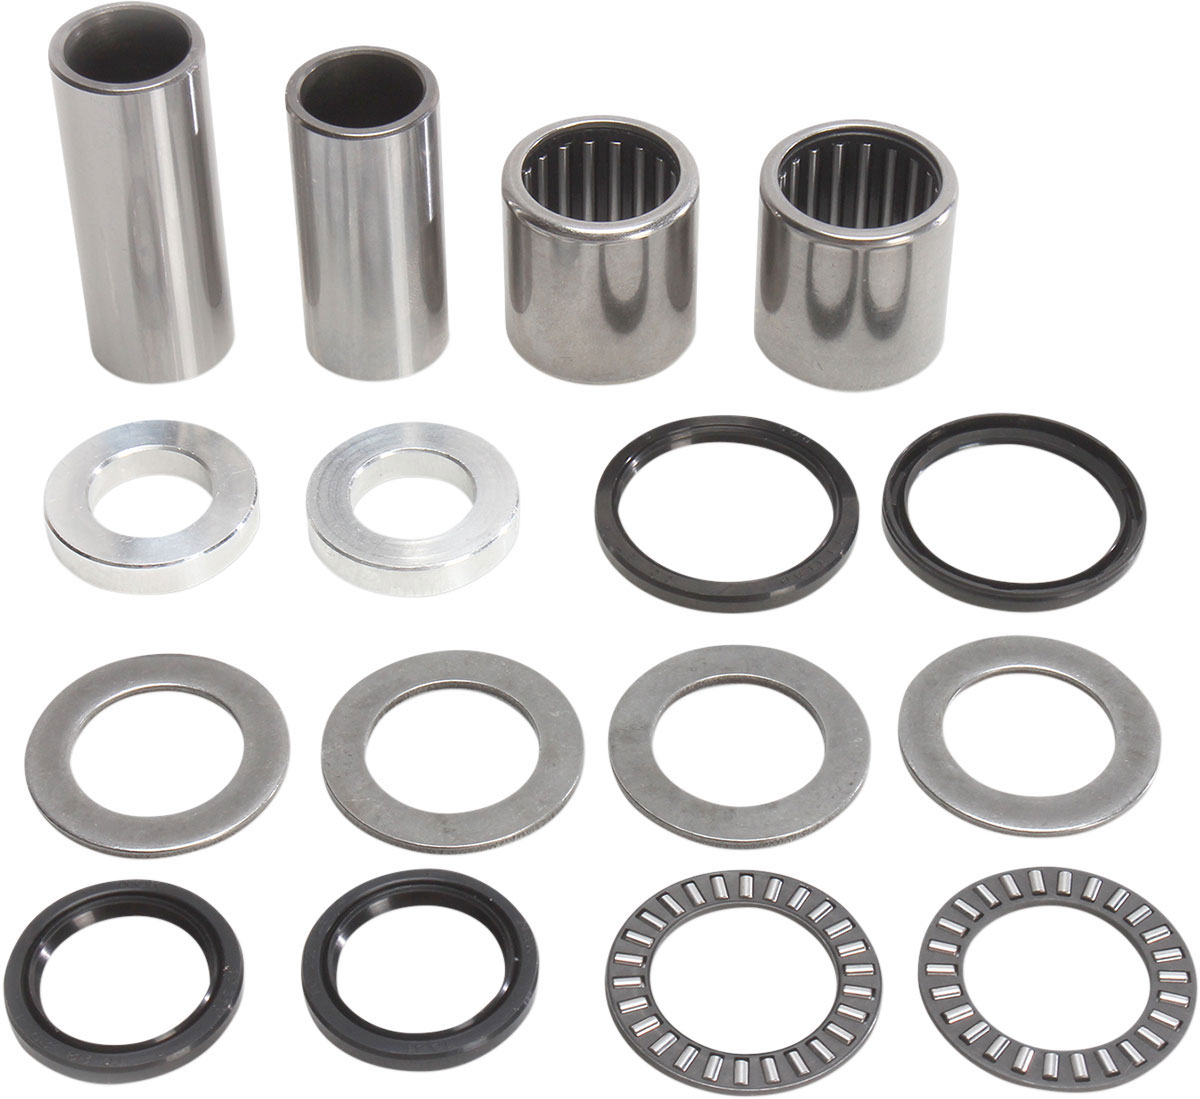 Bearing Connections Honda Swingarm Bearing Kit (401-0088)